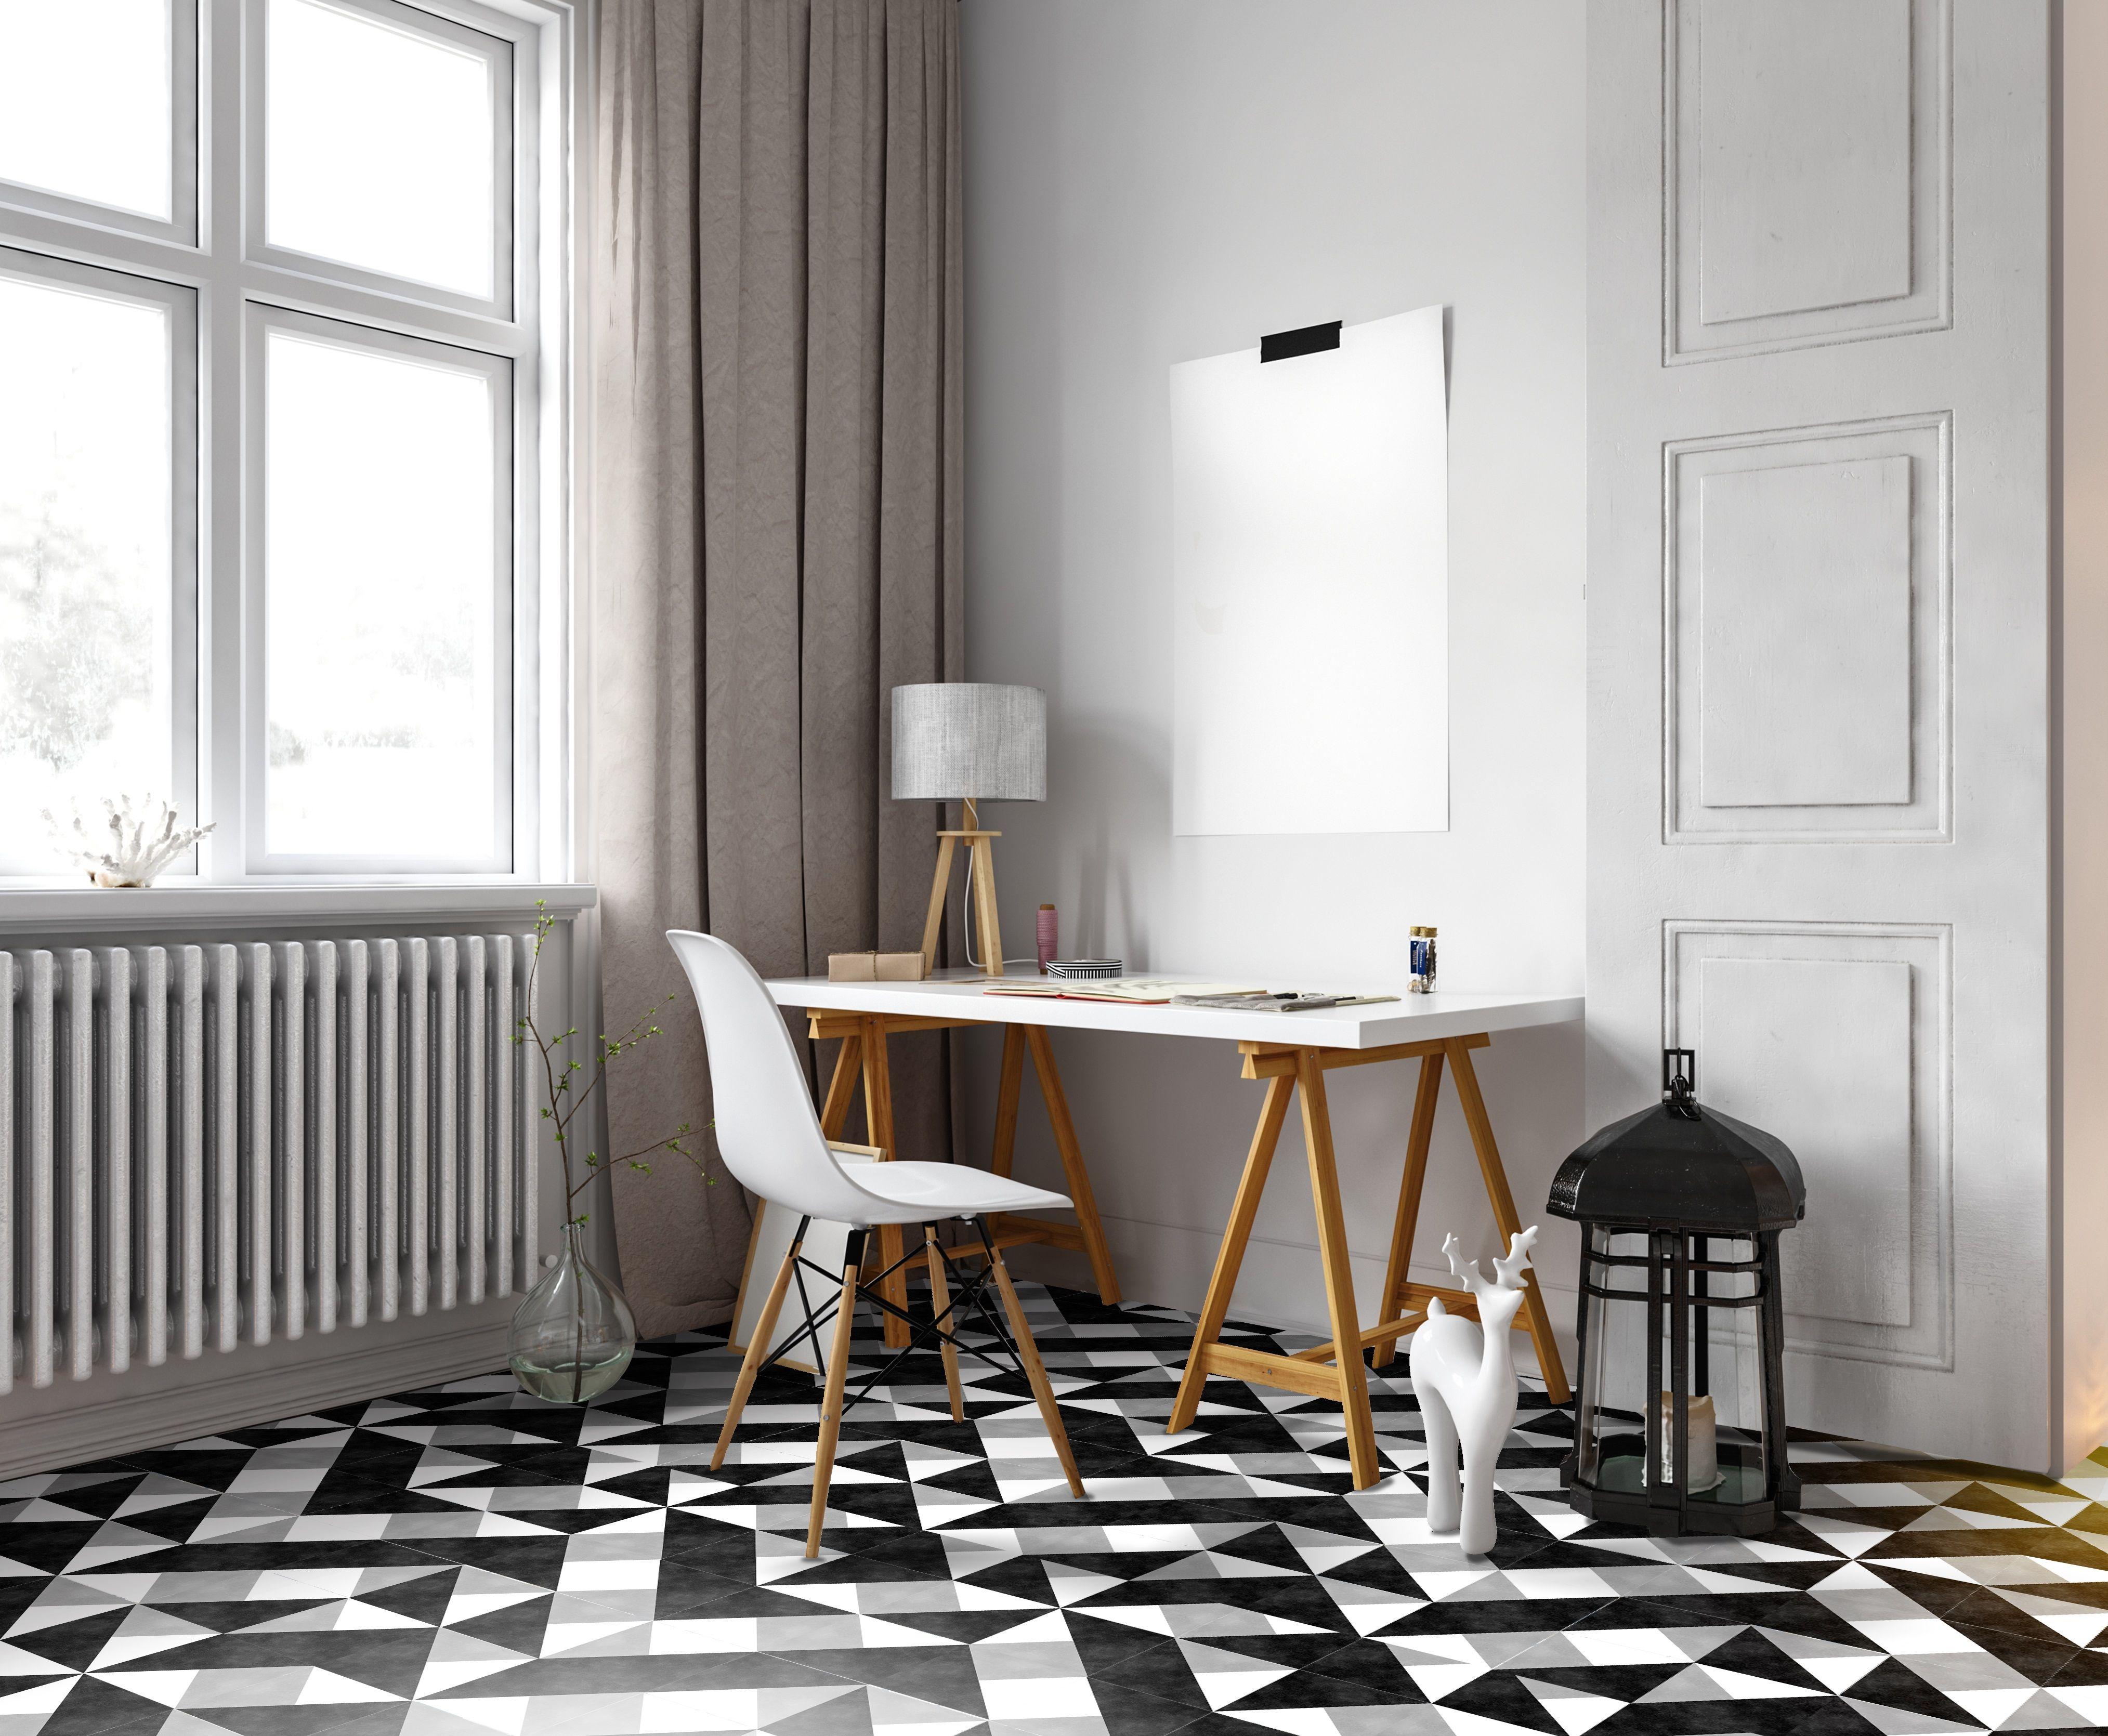 Frame 15 Floor Tiles 150x150mm R10 Slip Rating 10 Patterns To Choose From